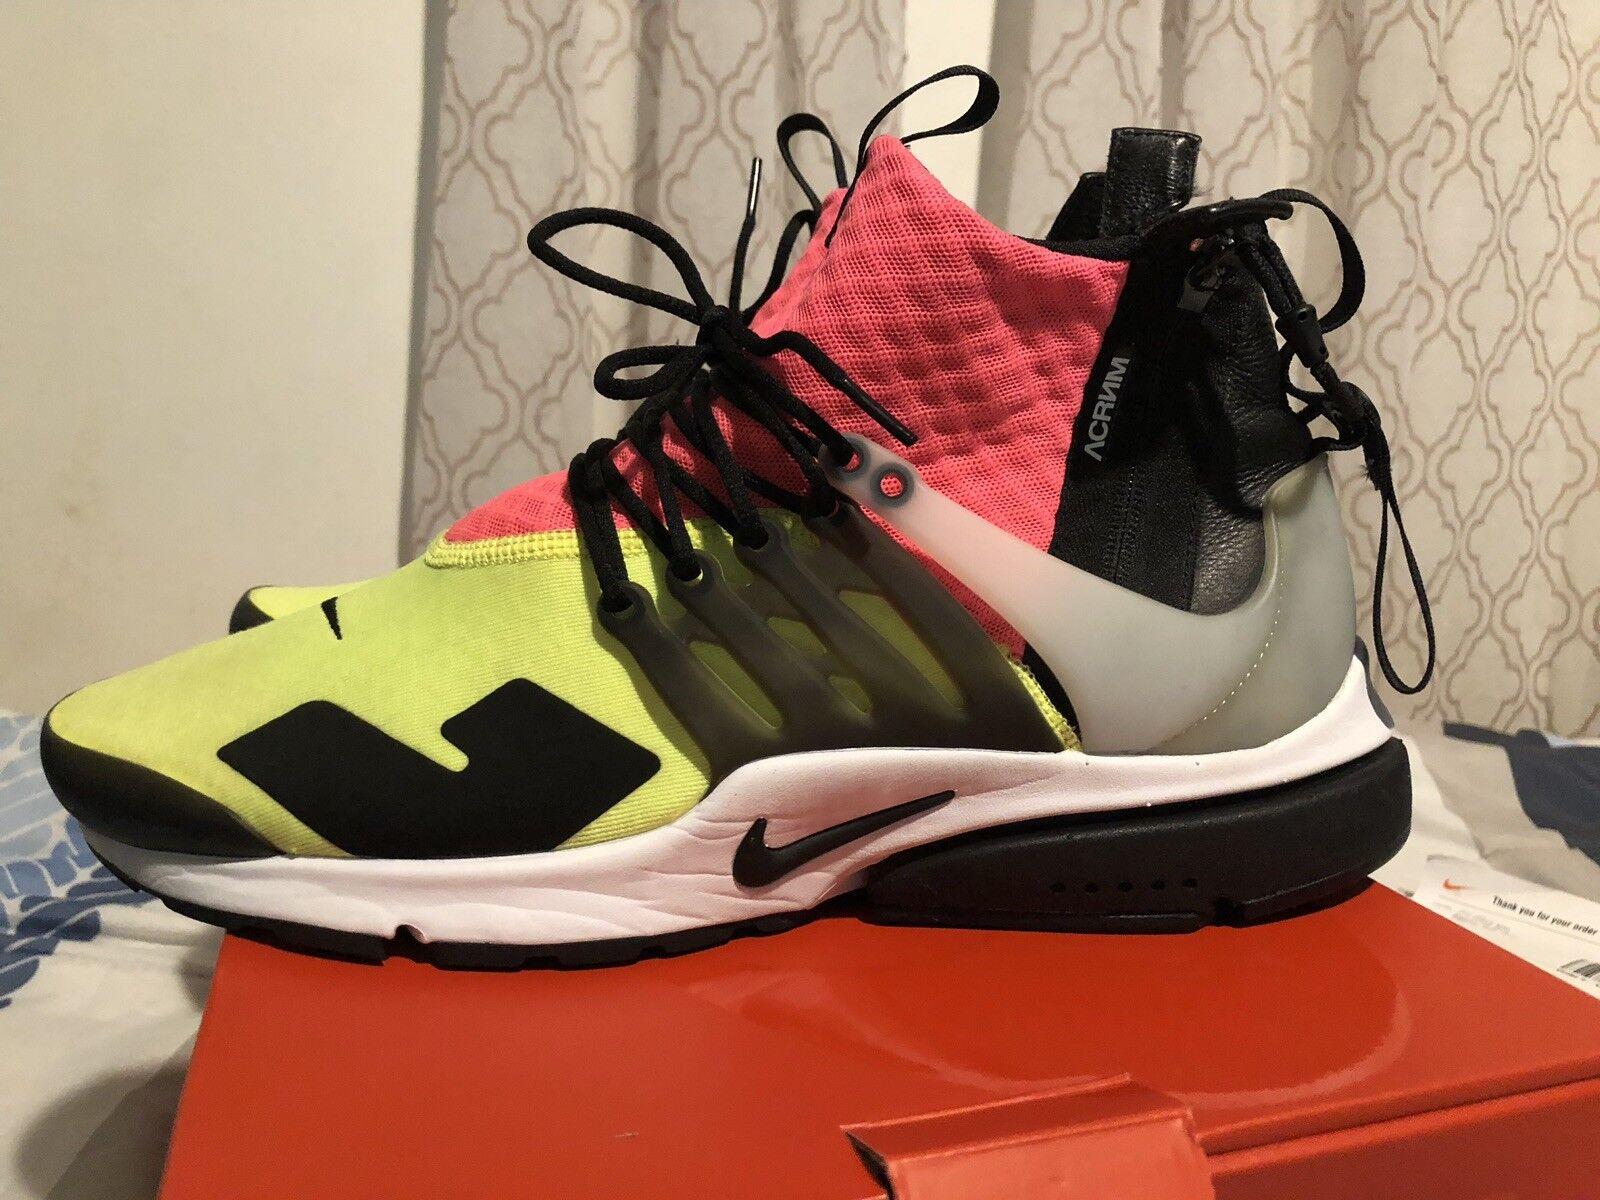 Nike Acronym Presto OG Lava Volt Sz. L 11-12 Off-white Union